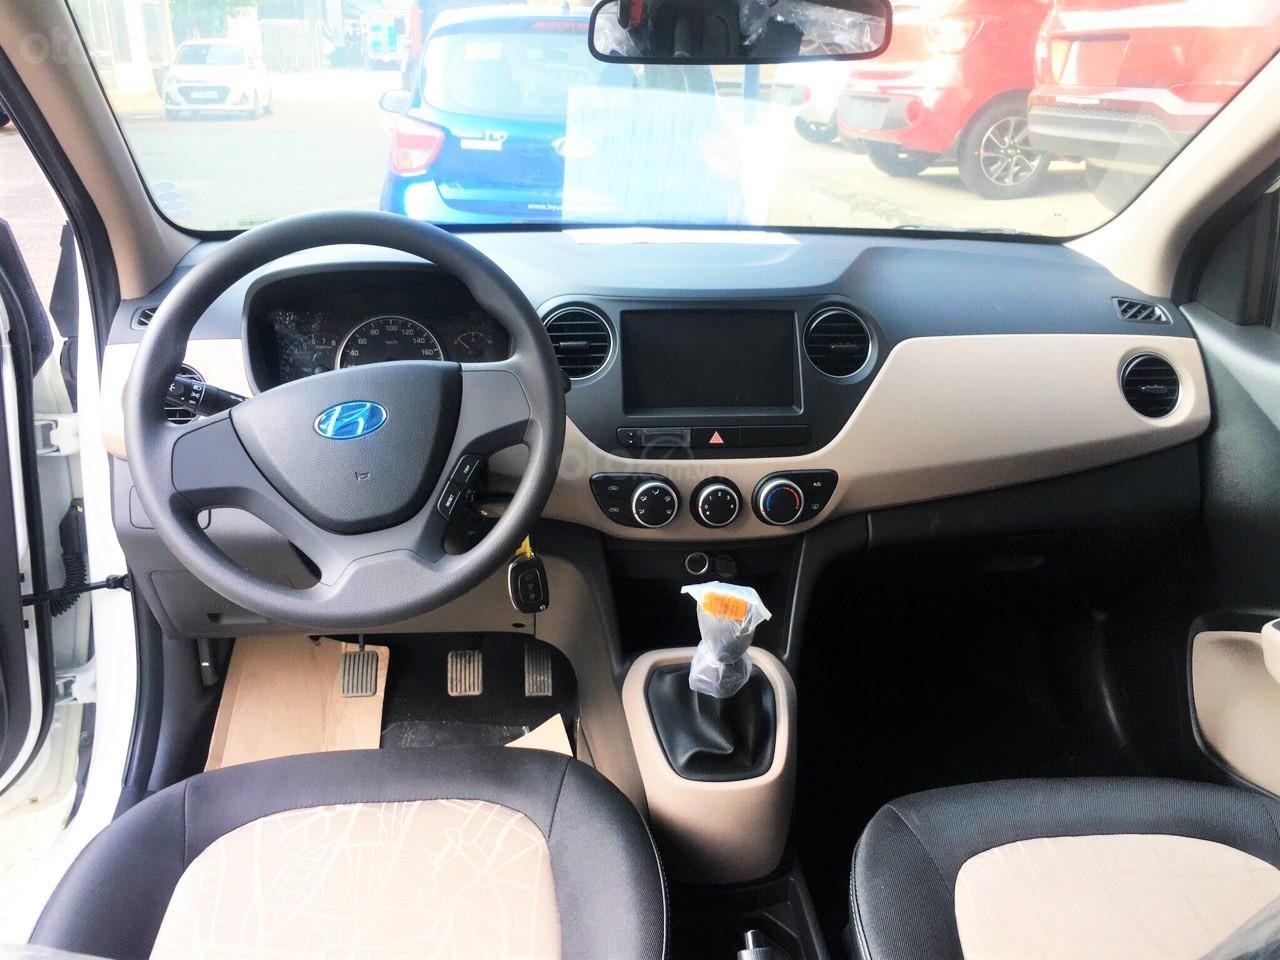 Bán Hyundai Grand i10 Hatchback 1.2MT Base giá tốt nhất Miền Nam (2)